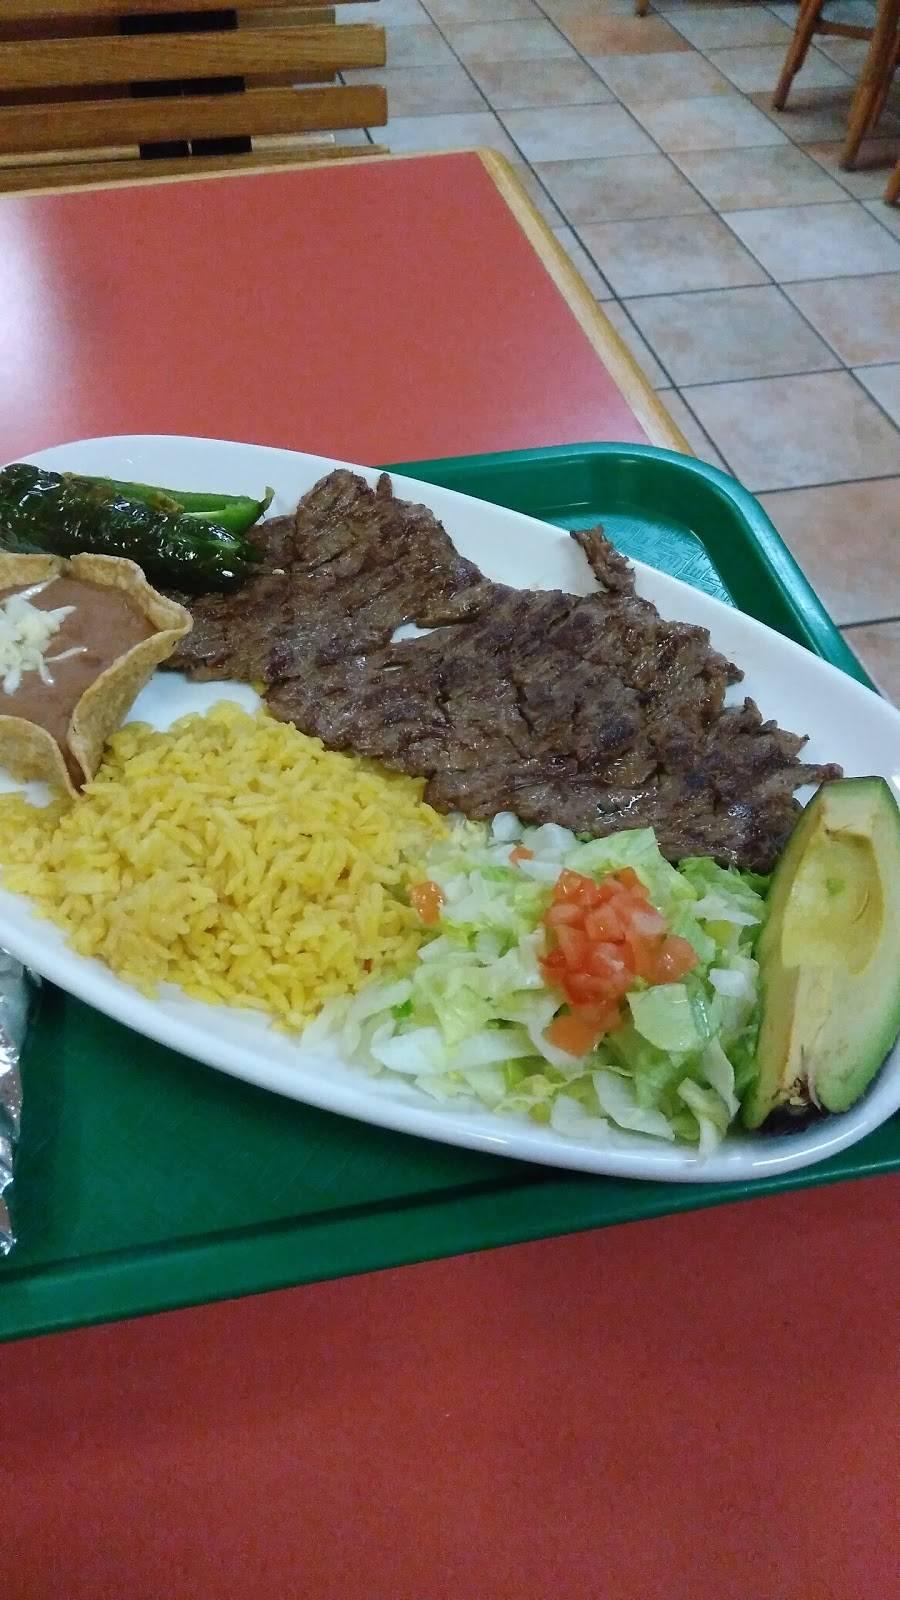 El Hogar Mexican Restaurant   restaurant   1015 E Ogden Ave, Naperville, IL 60563, USA   6303558888 OR +1 630-355-8888